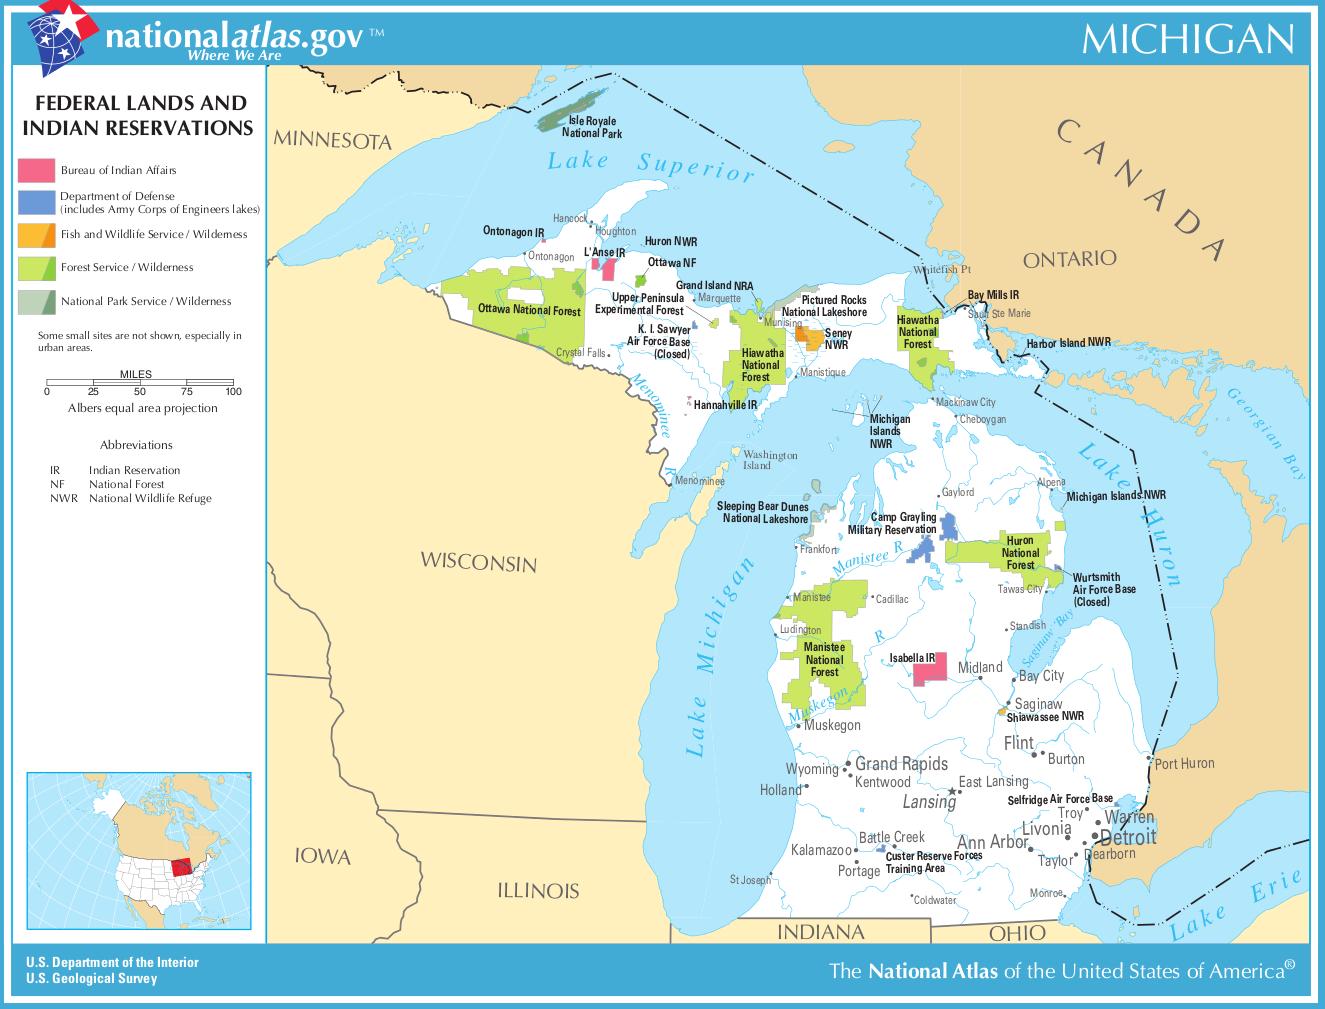 Michigan-federal-lands-indian-reservations-map | Weltatlas